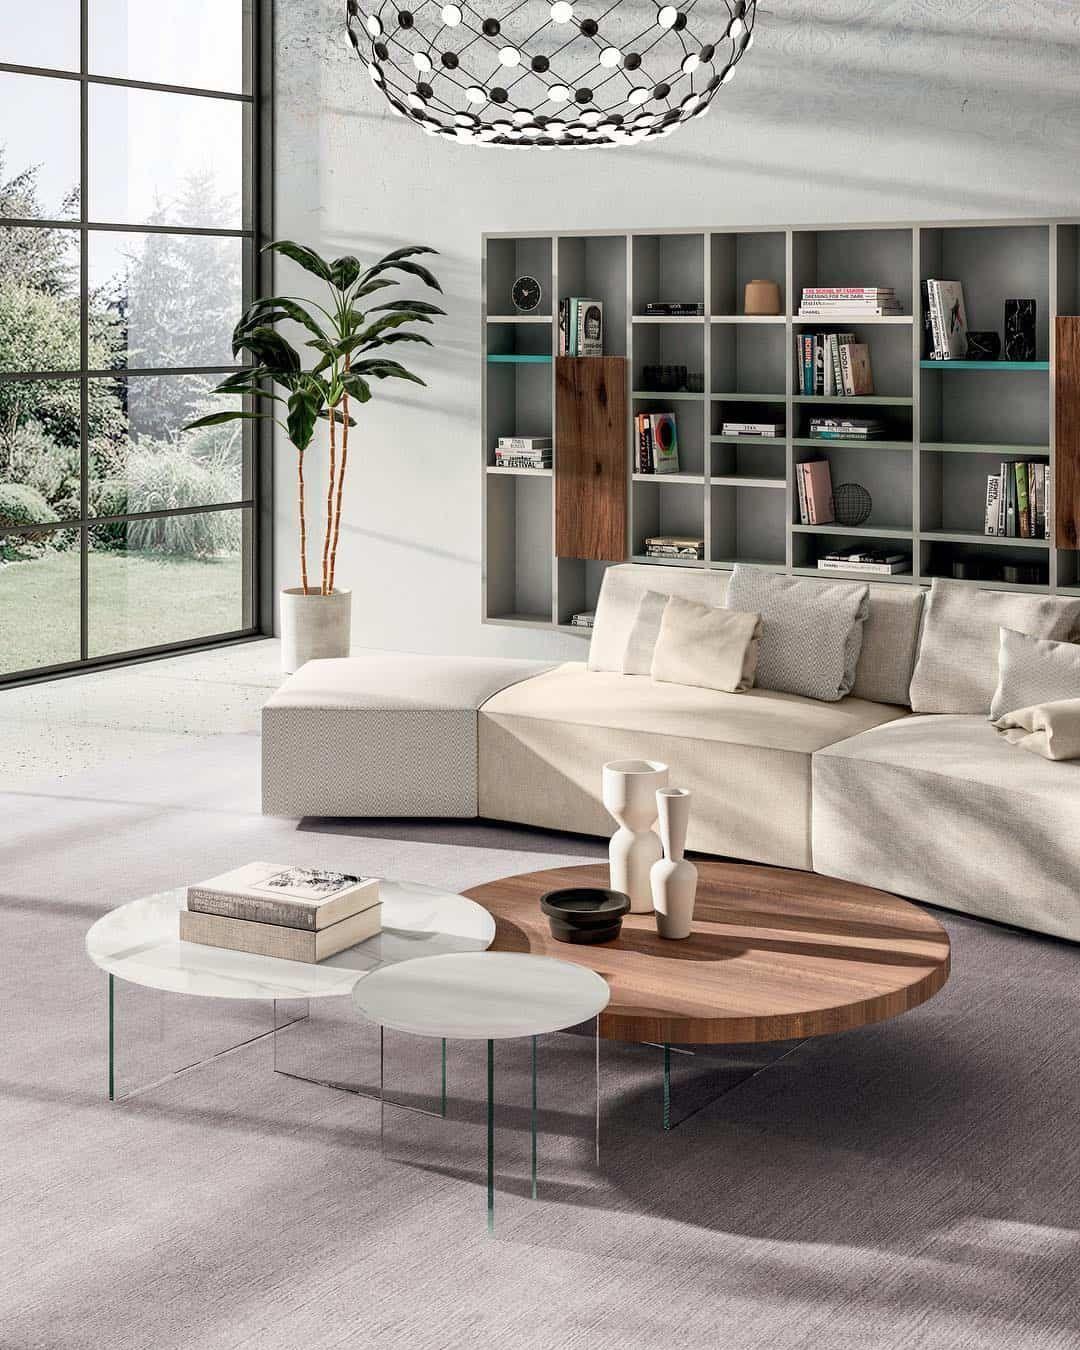 Italian Luxury Furniture Designer Furniture Singapore Da Vinci Lifestyle Contemporary Furniture Design Interior Design Guide Furniture Design [ 1350 x 1080 Pixel ]